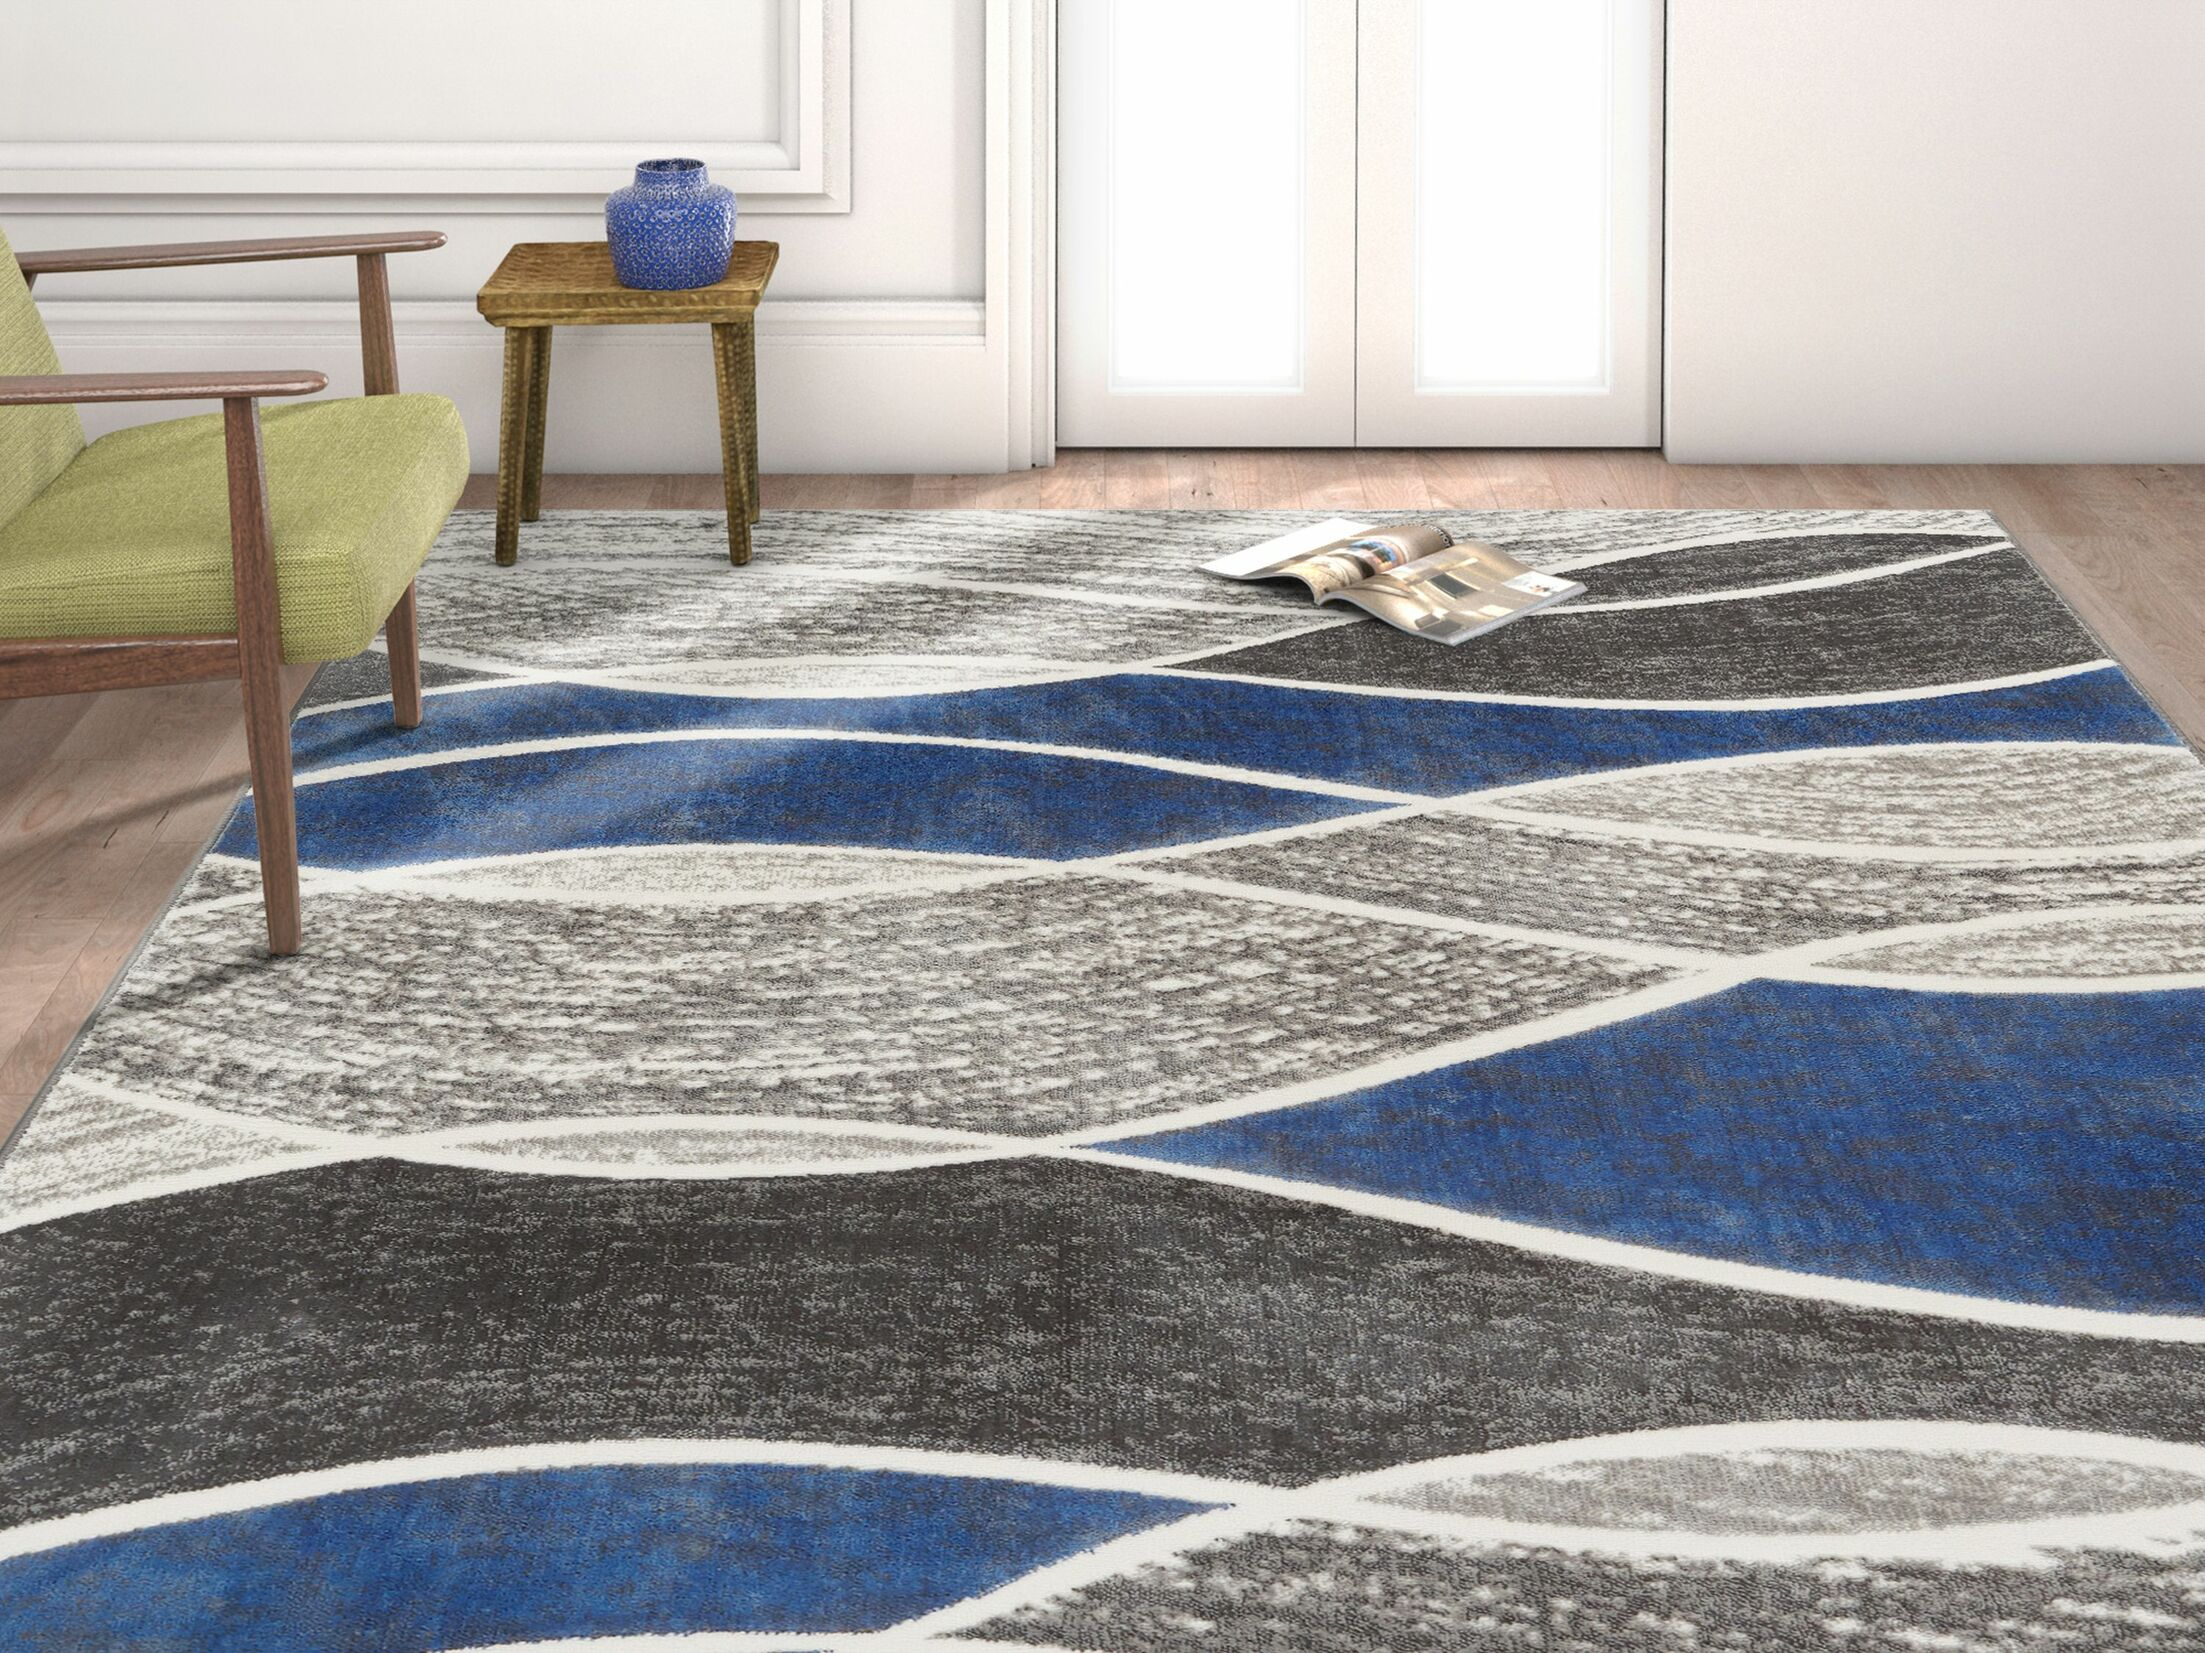 Giardina Abstract Swirls Blue Area Rug Rug Size: Rectangle 7'10